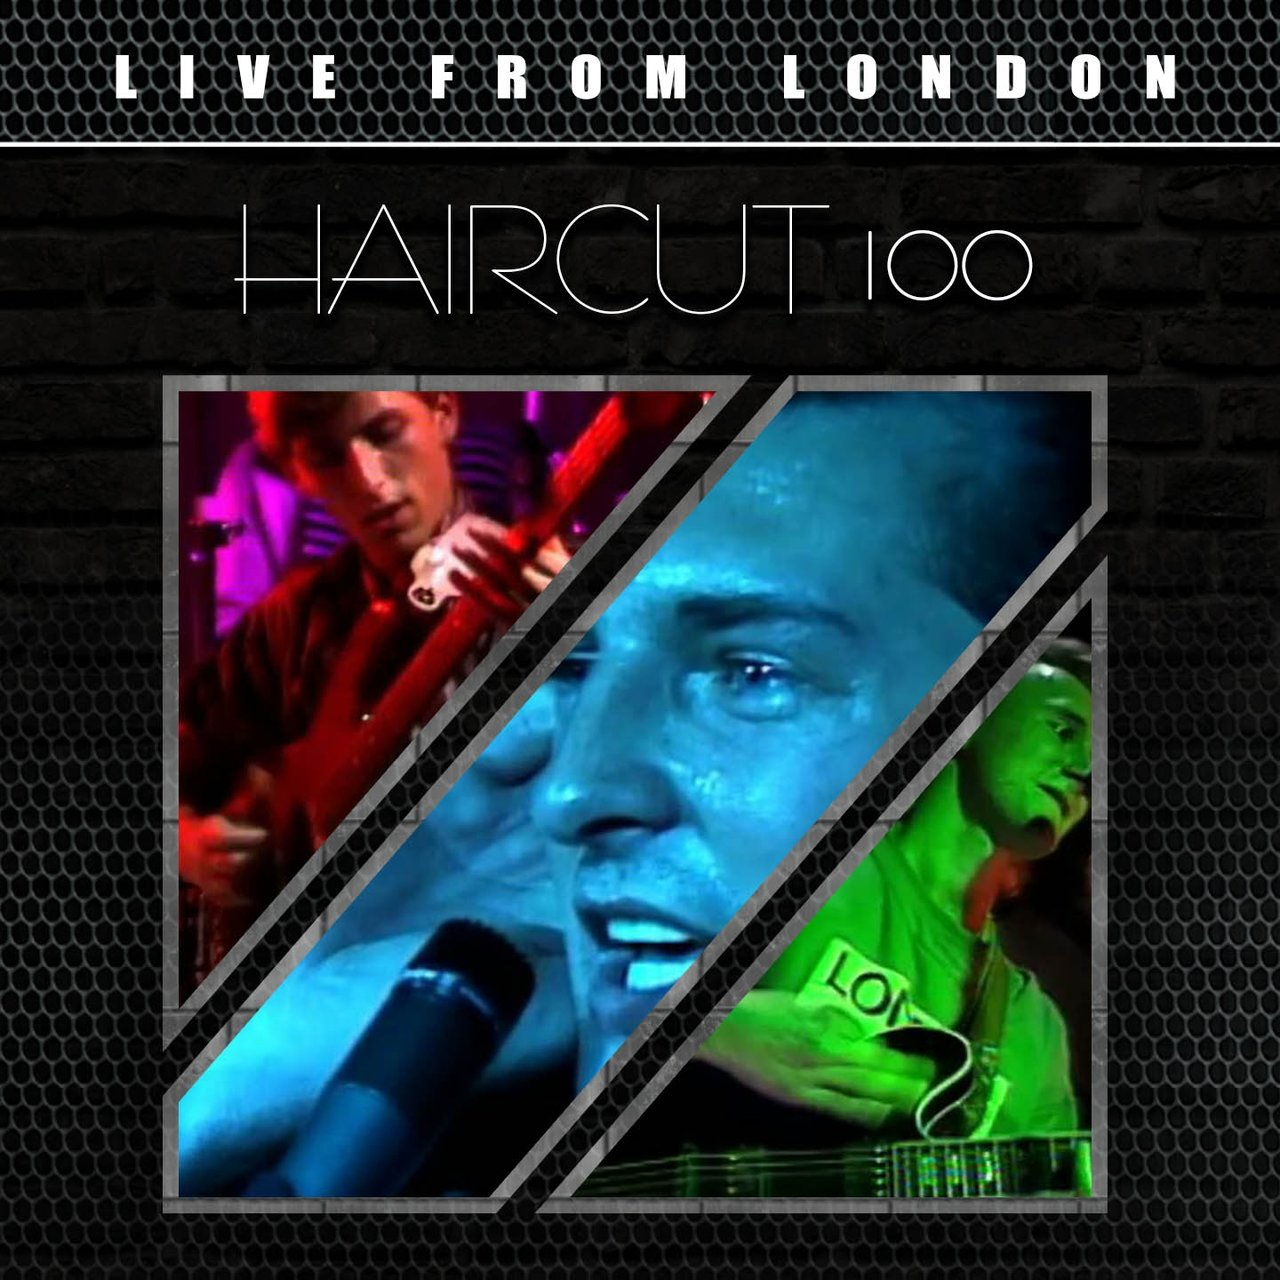 Tidal Listen To Haircut 100 On Tidal